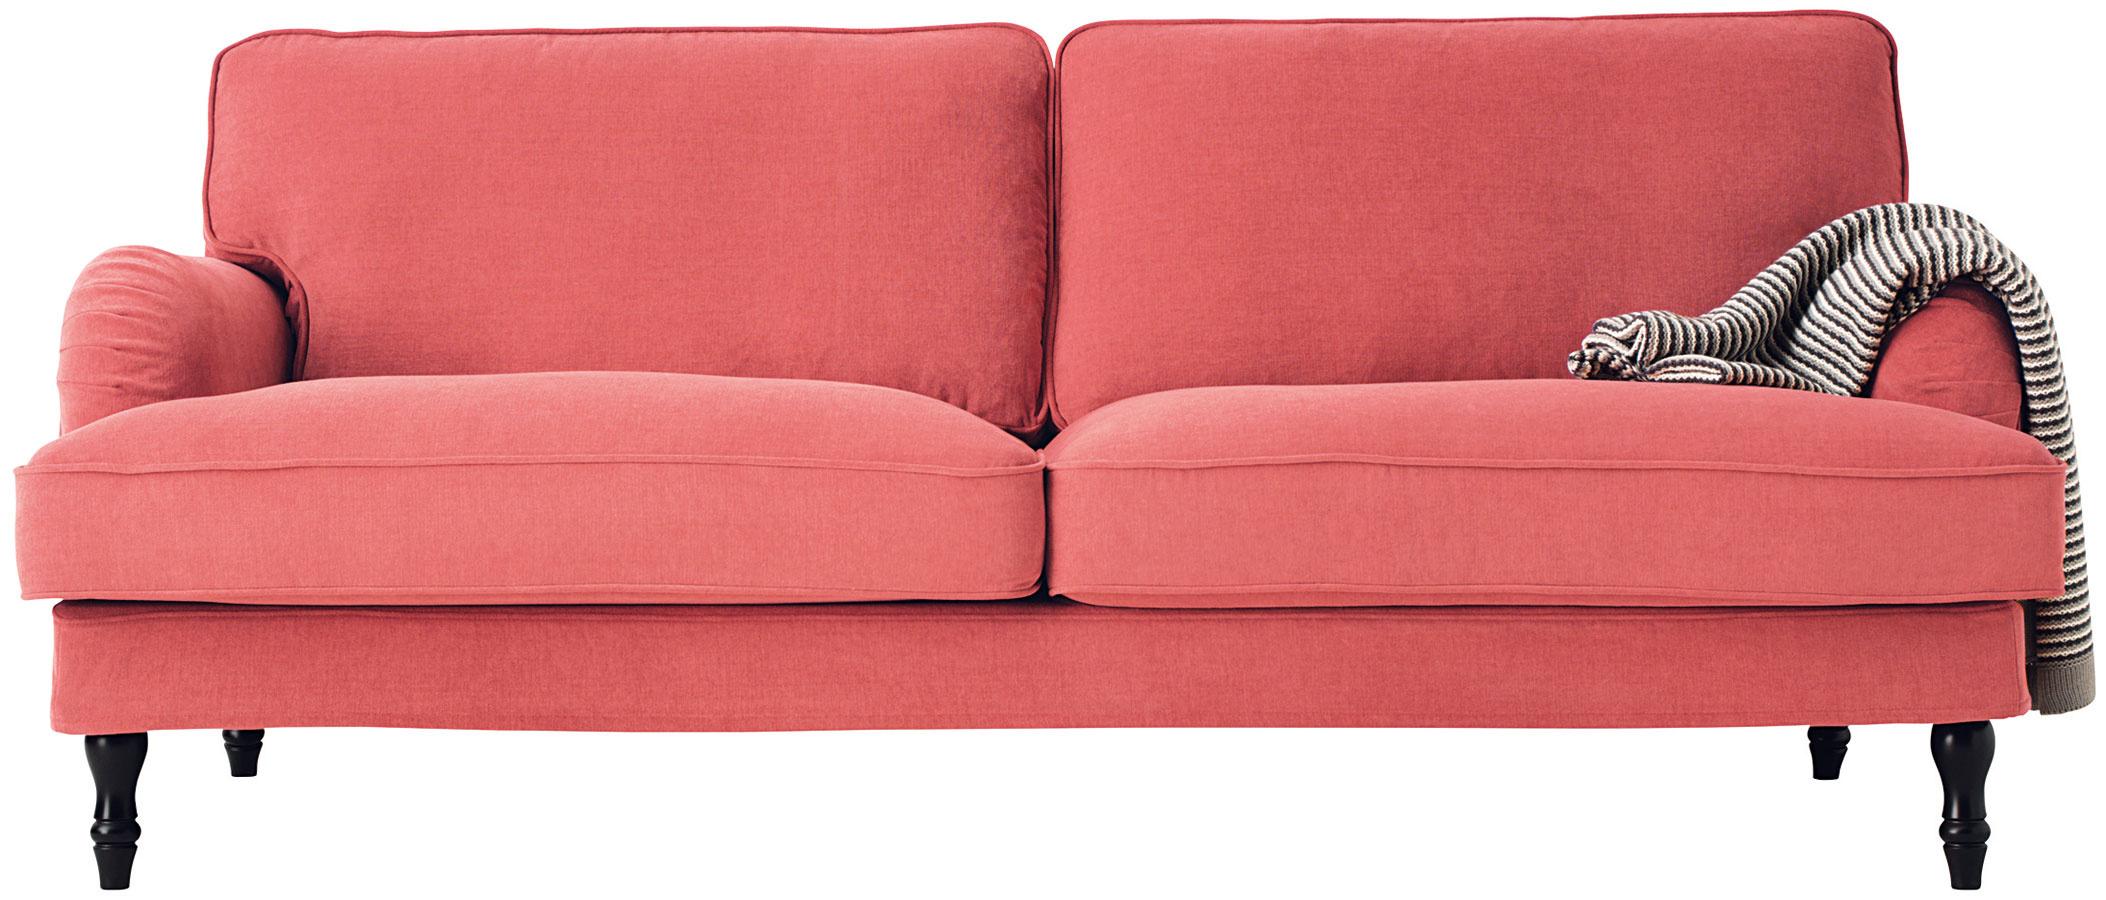 Trojpohovka STOCKSUND, 599 €, IKEA